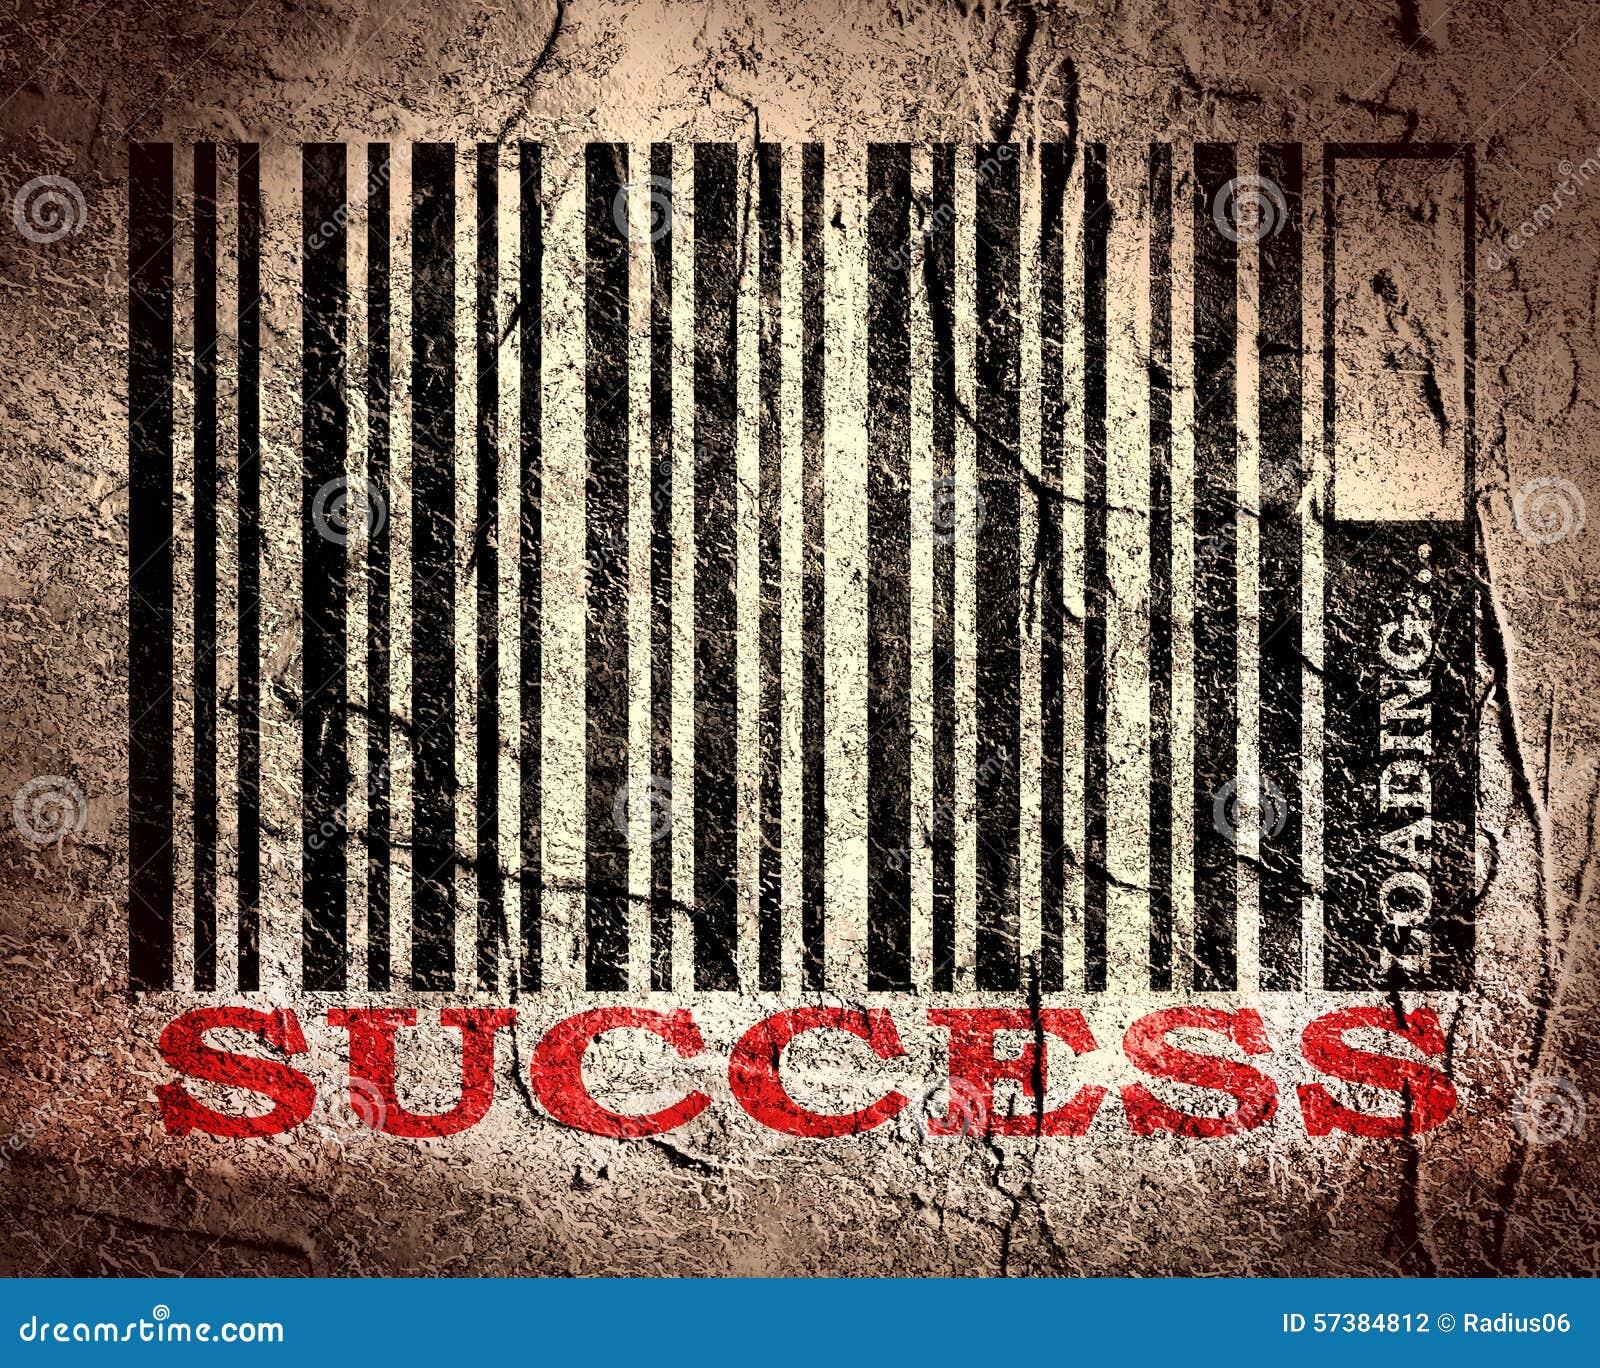 Streepjescode met succestekst en ladingsbar